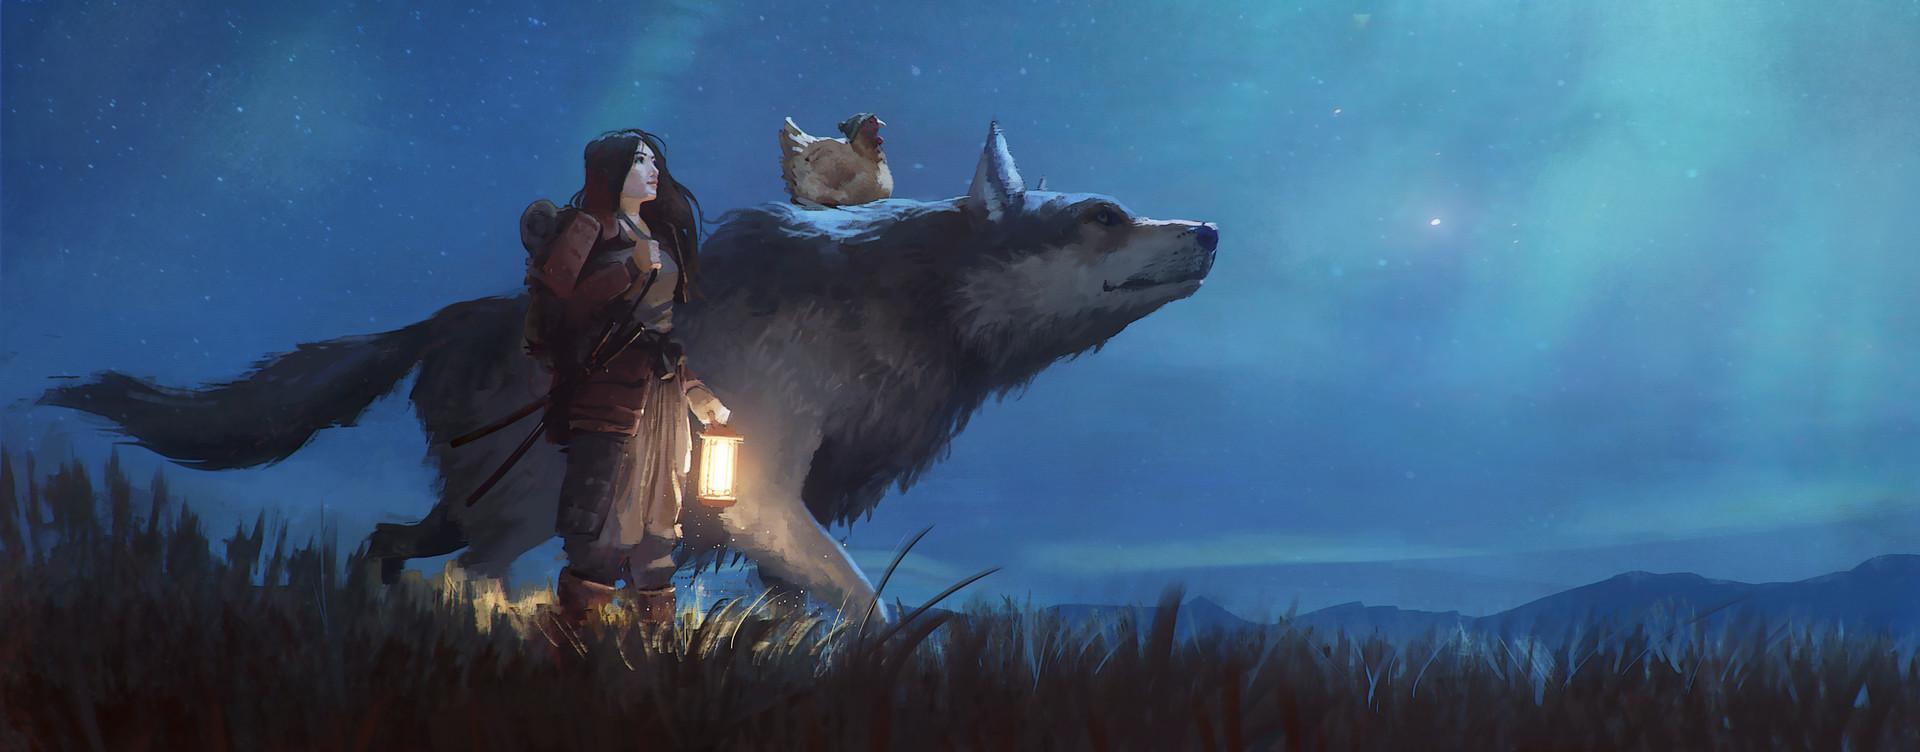 Julien gauthier bb wolf